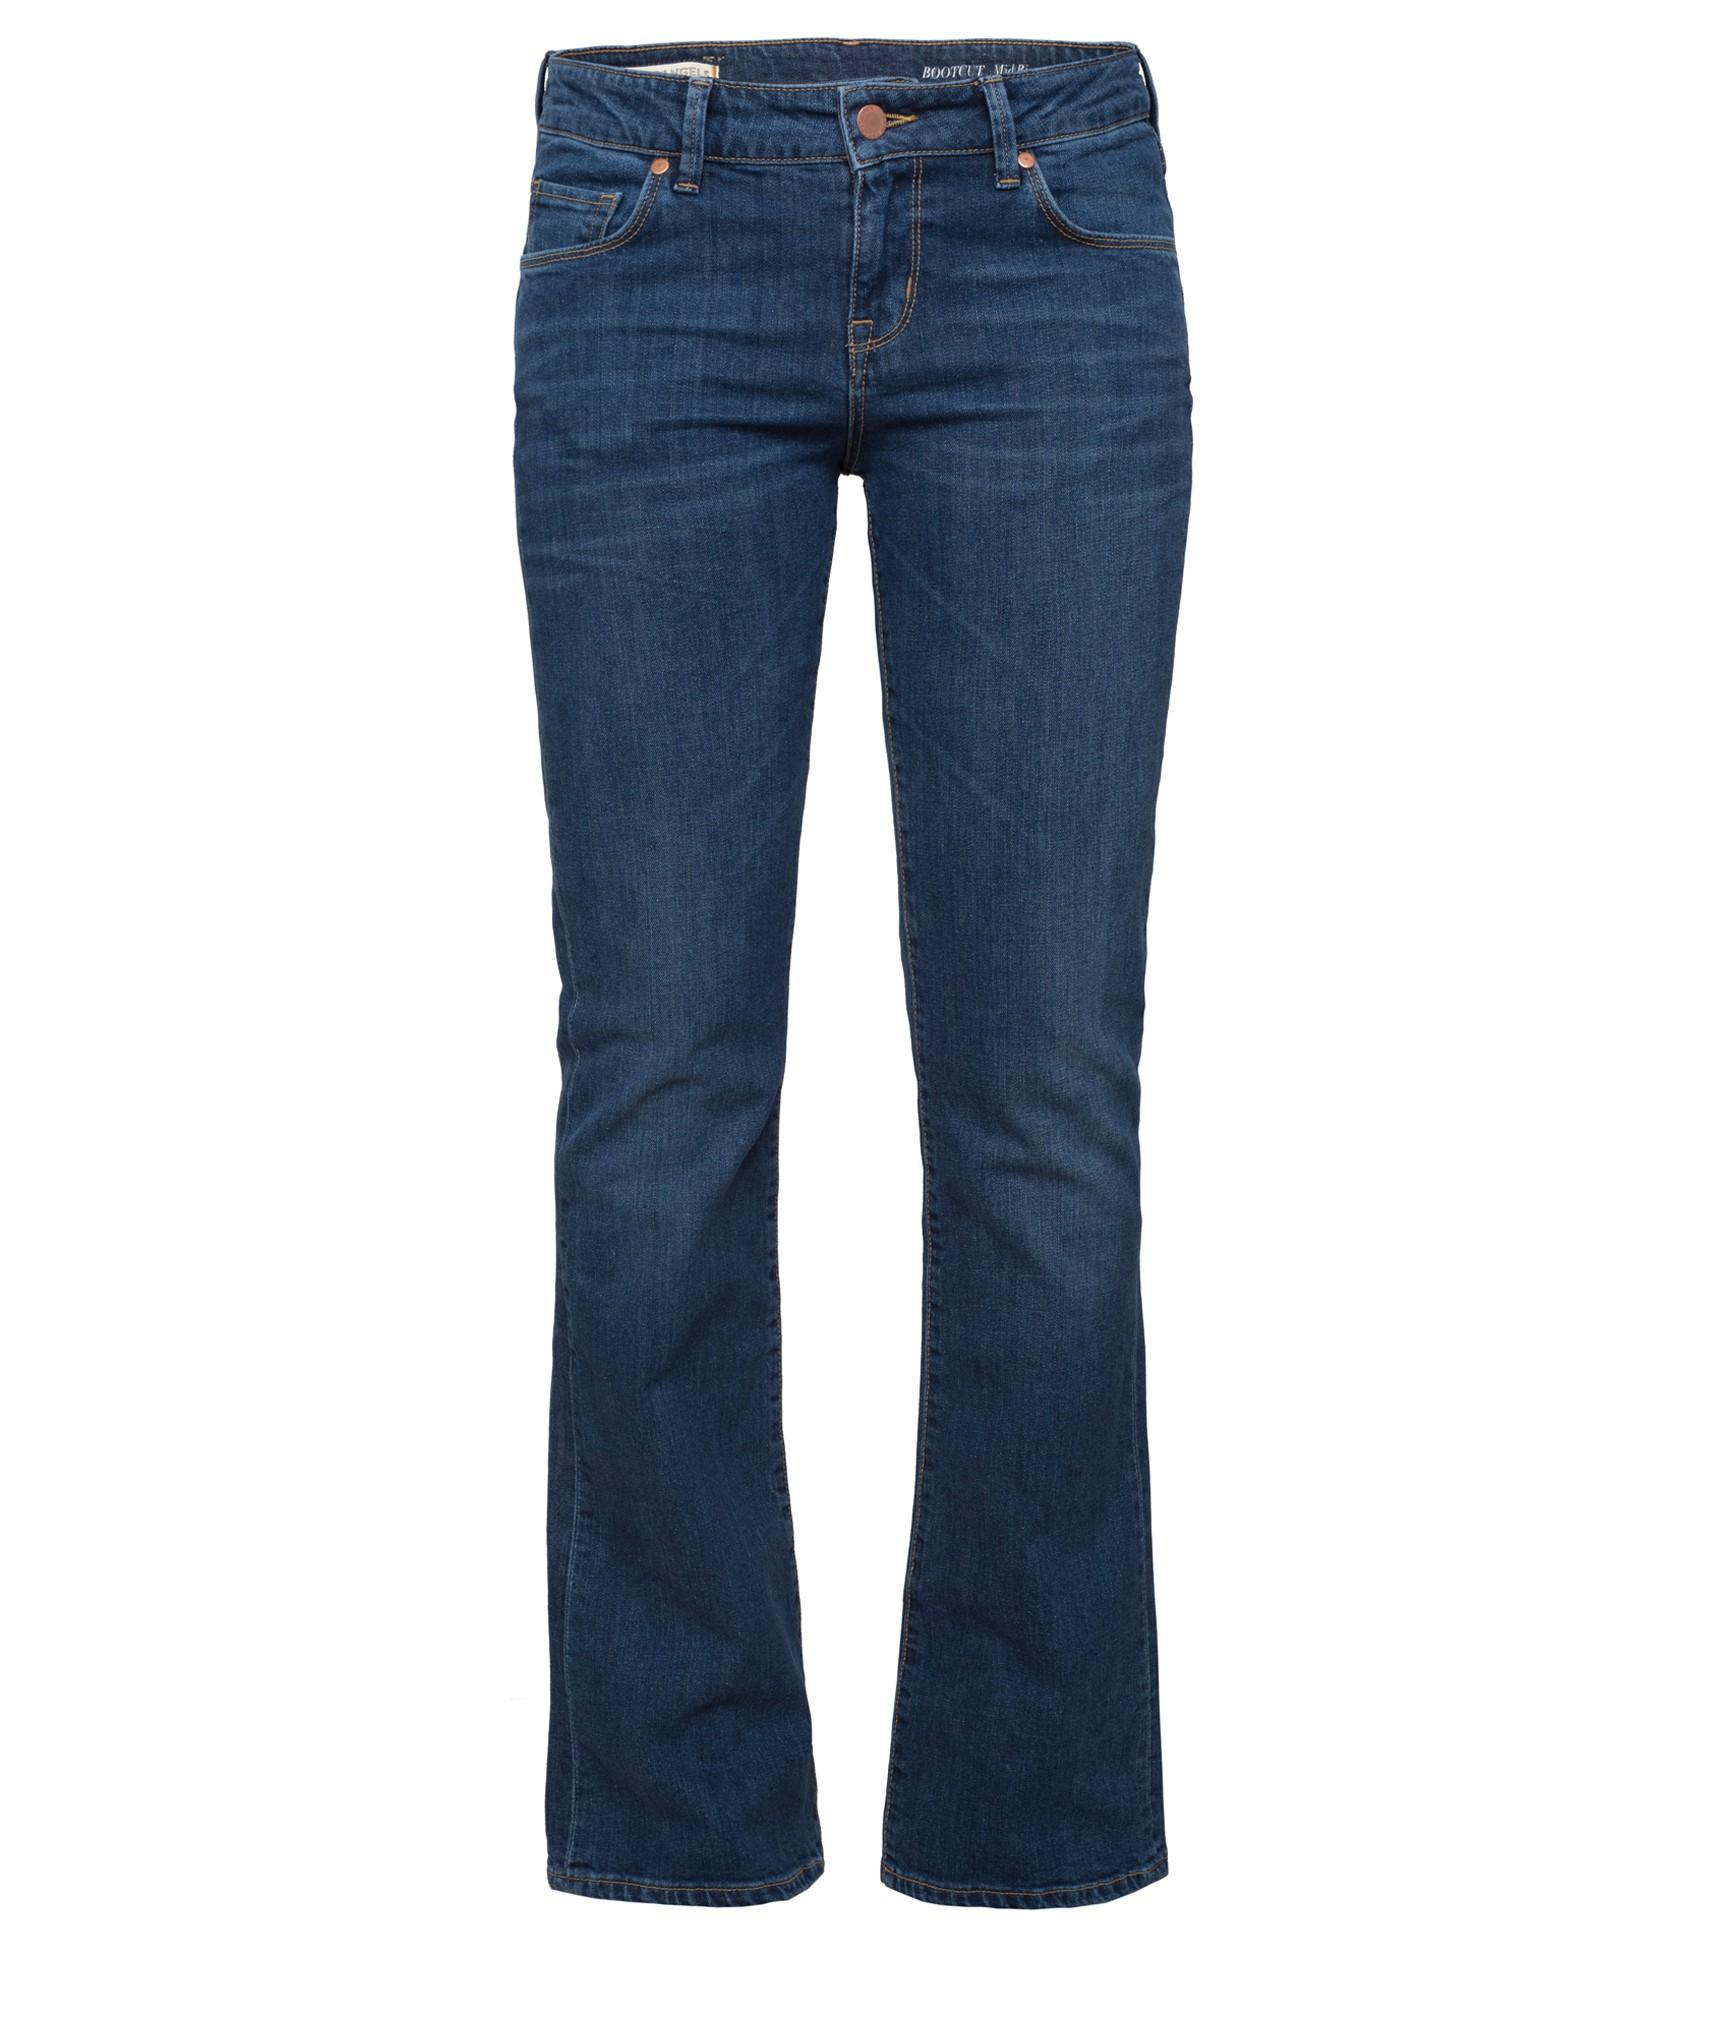 armedangels dita jeans bio jeans f r damen bei glore glore. Black Bedroom Furniture Sets. Home Design Ideas